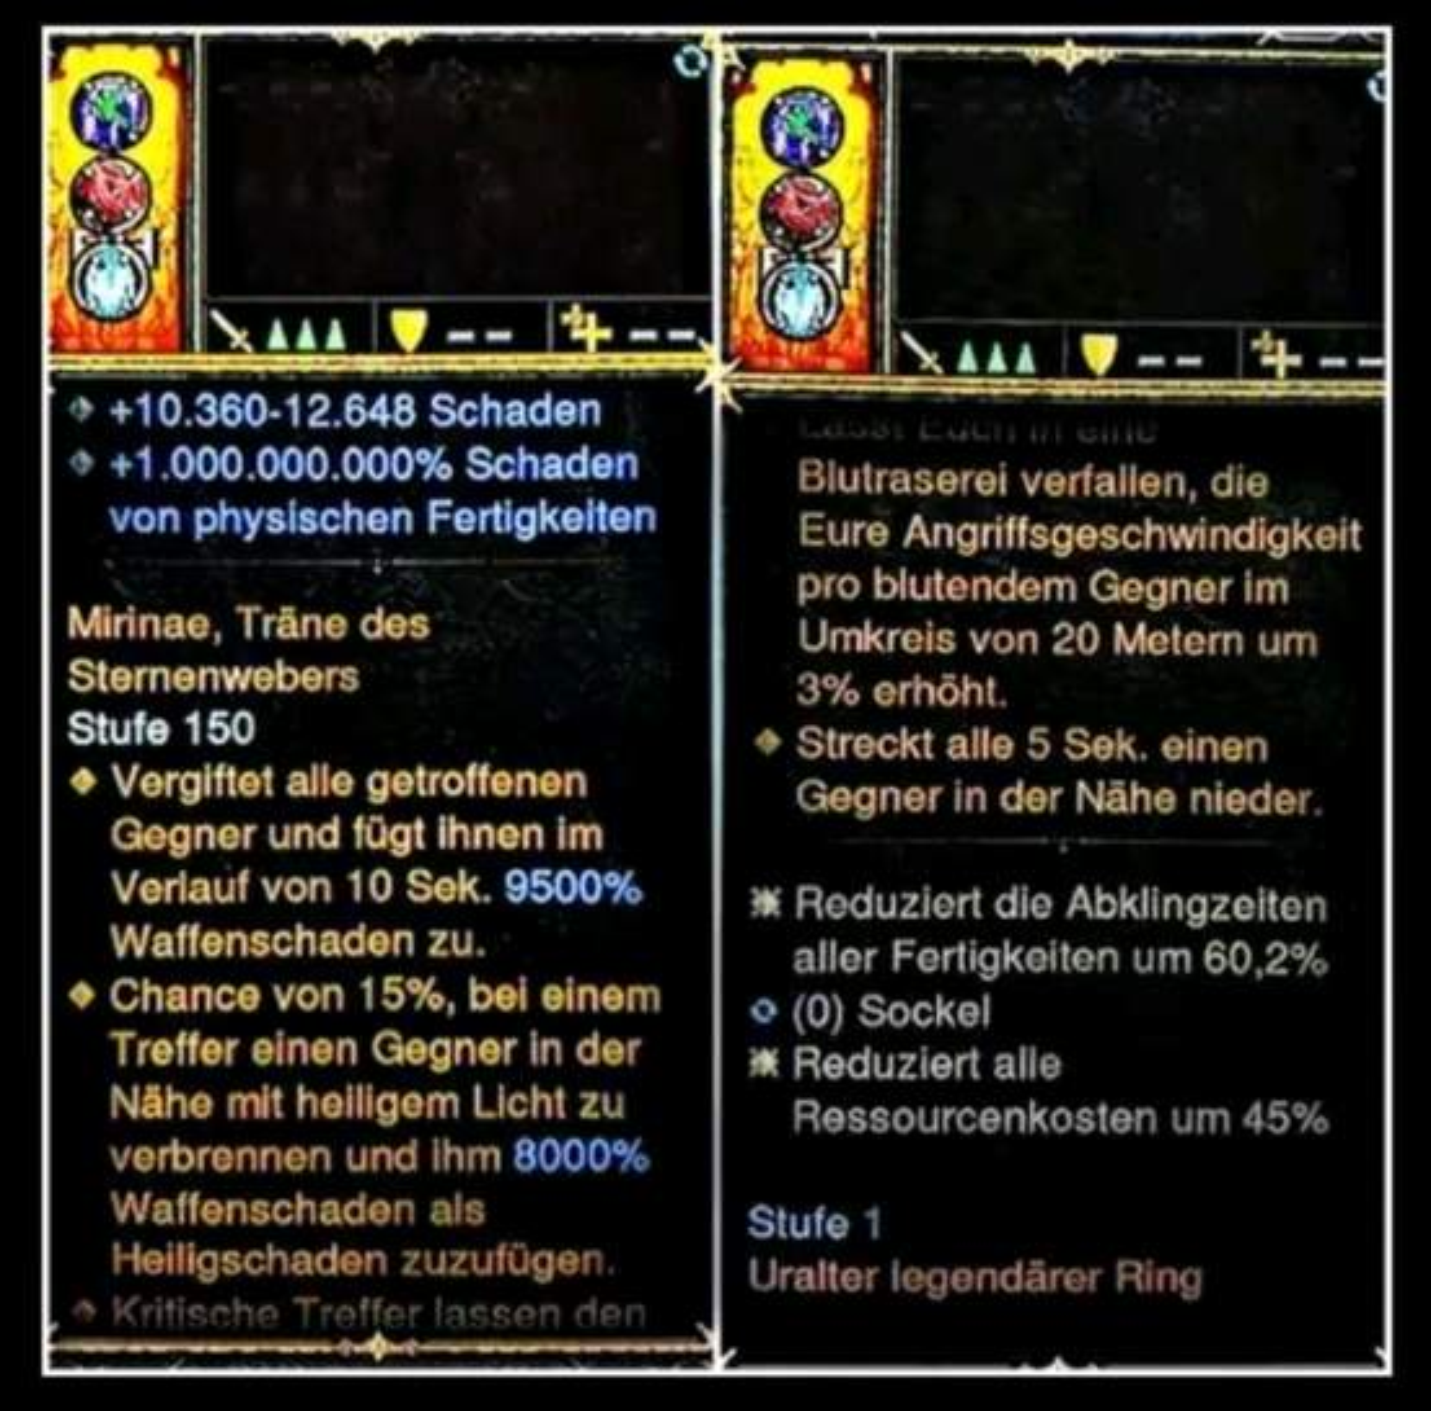 17020850-RDKQN.jpg